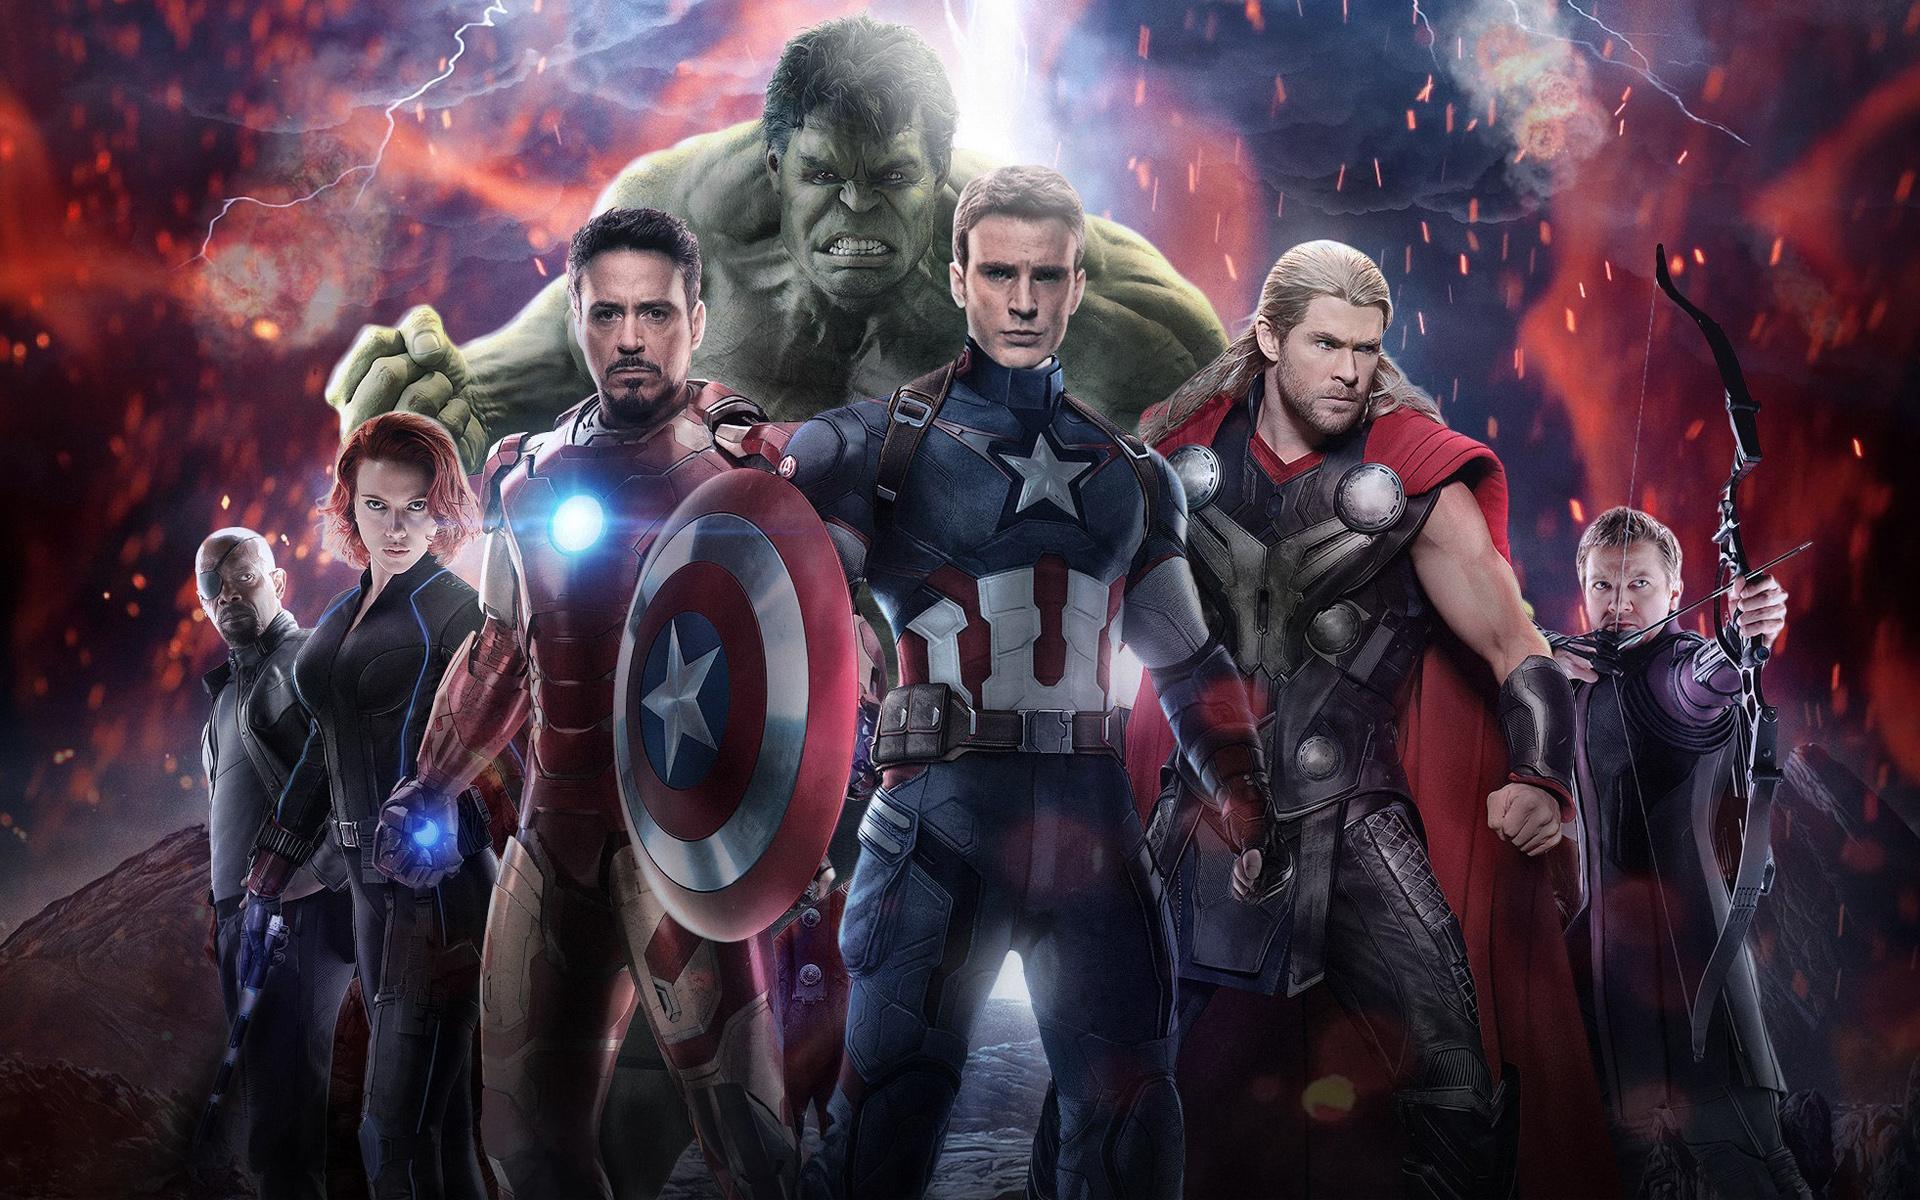 Galaxy Wallpaper For Iphone 4 電影 Avengers Age Of Ultron Chris Evans Hulk Scarlett